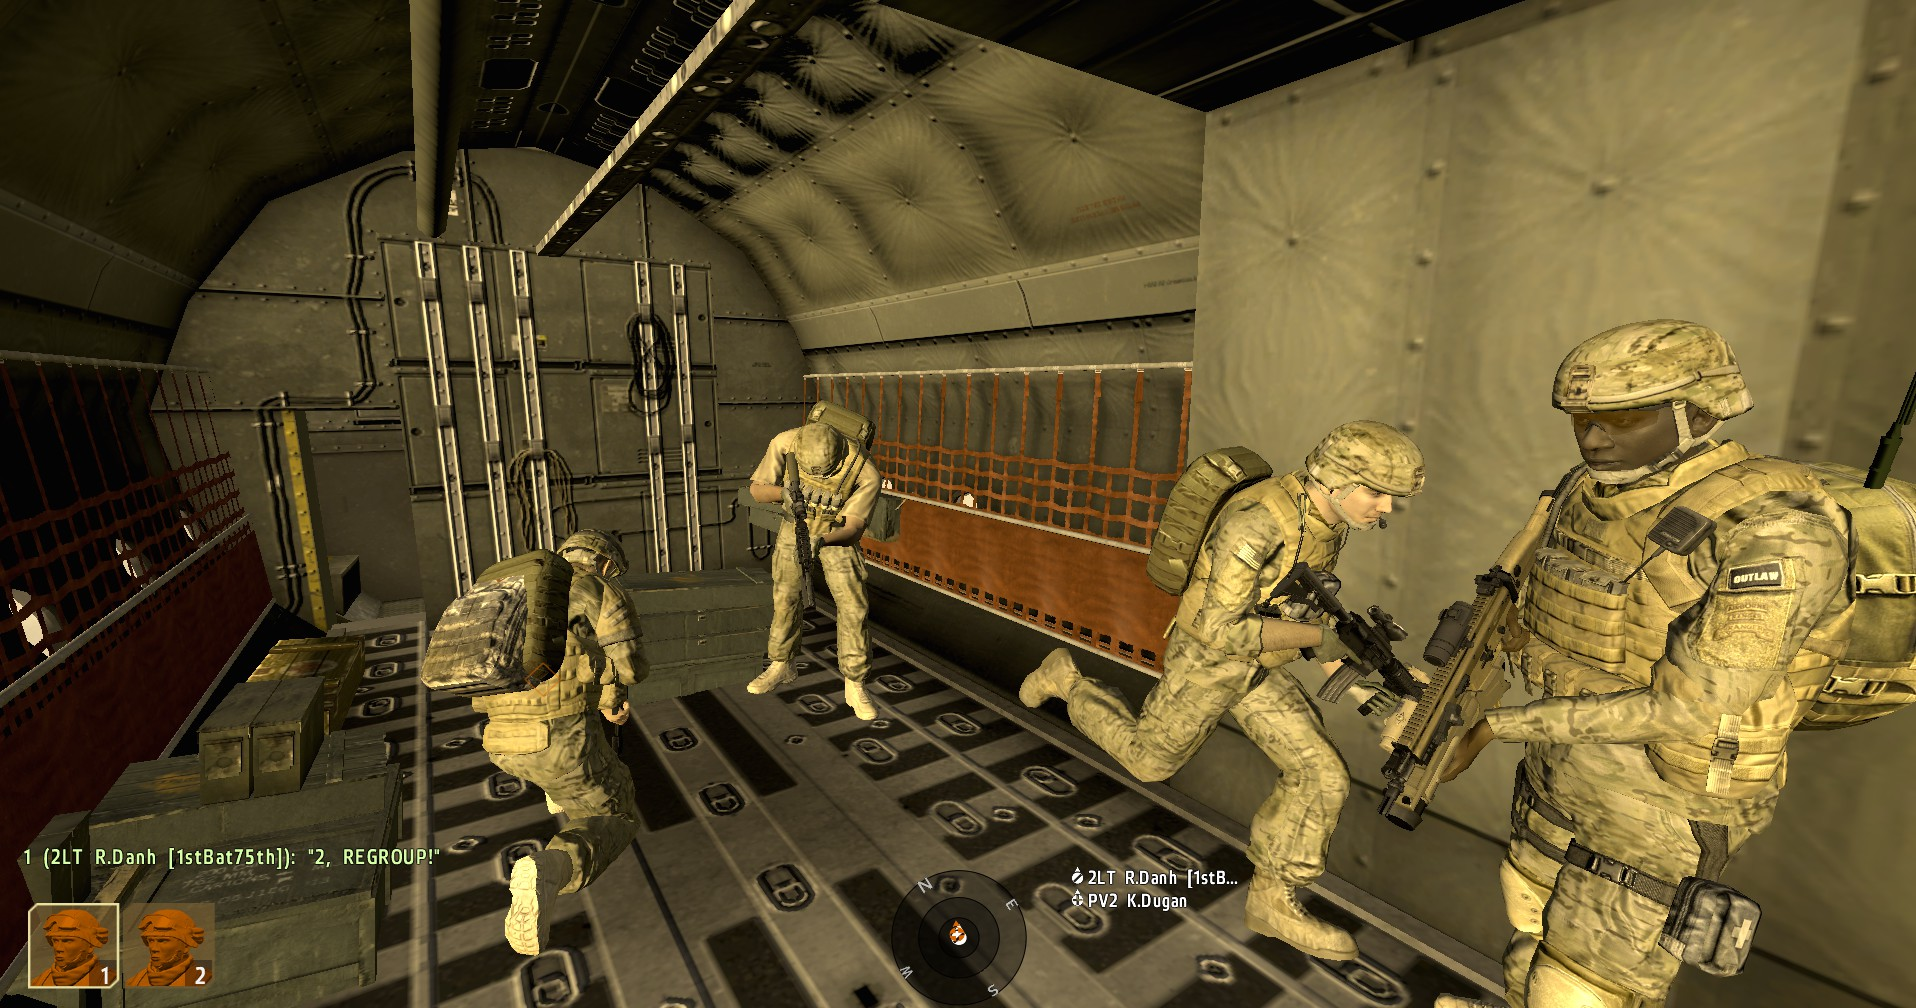 [Operation] Operation Behind Enemy Lines 3/04/17 [AAR] 6F04C5B94F64675E8492FF67D438BCC99C8BFA99